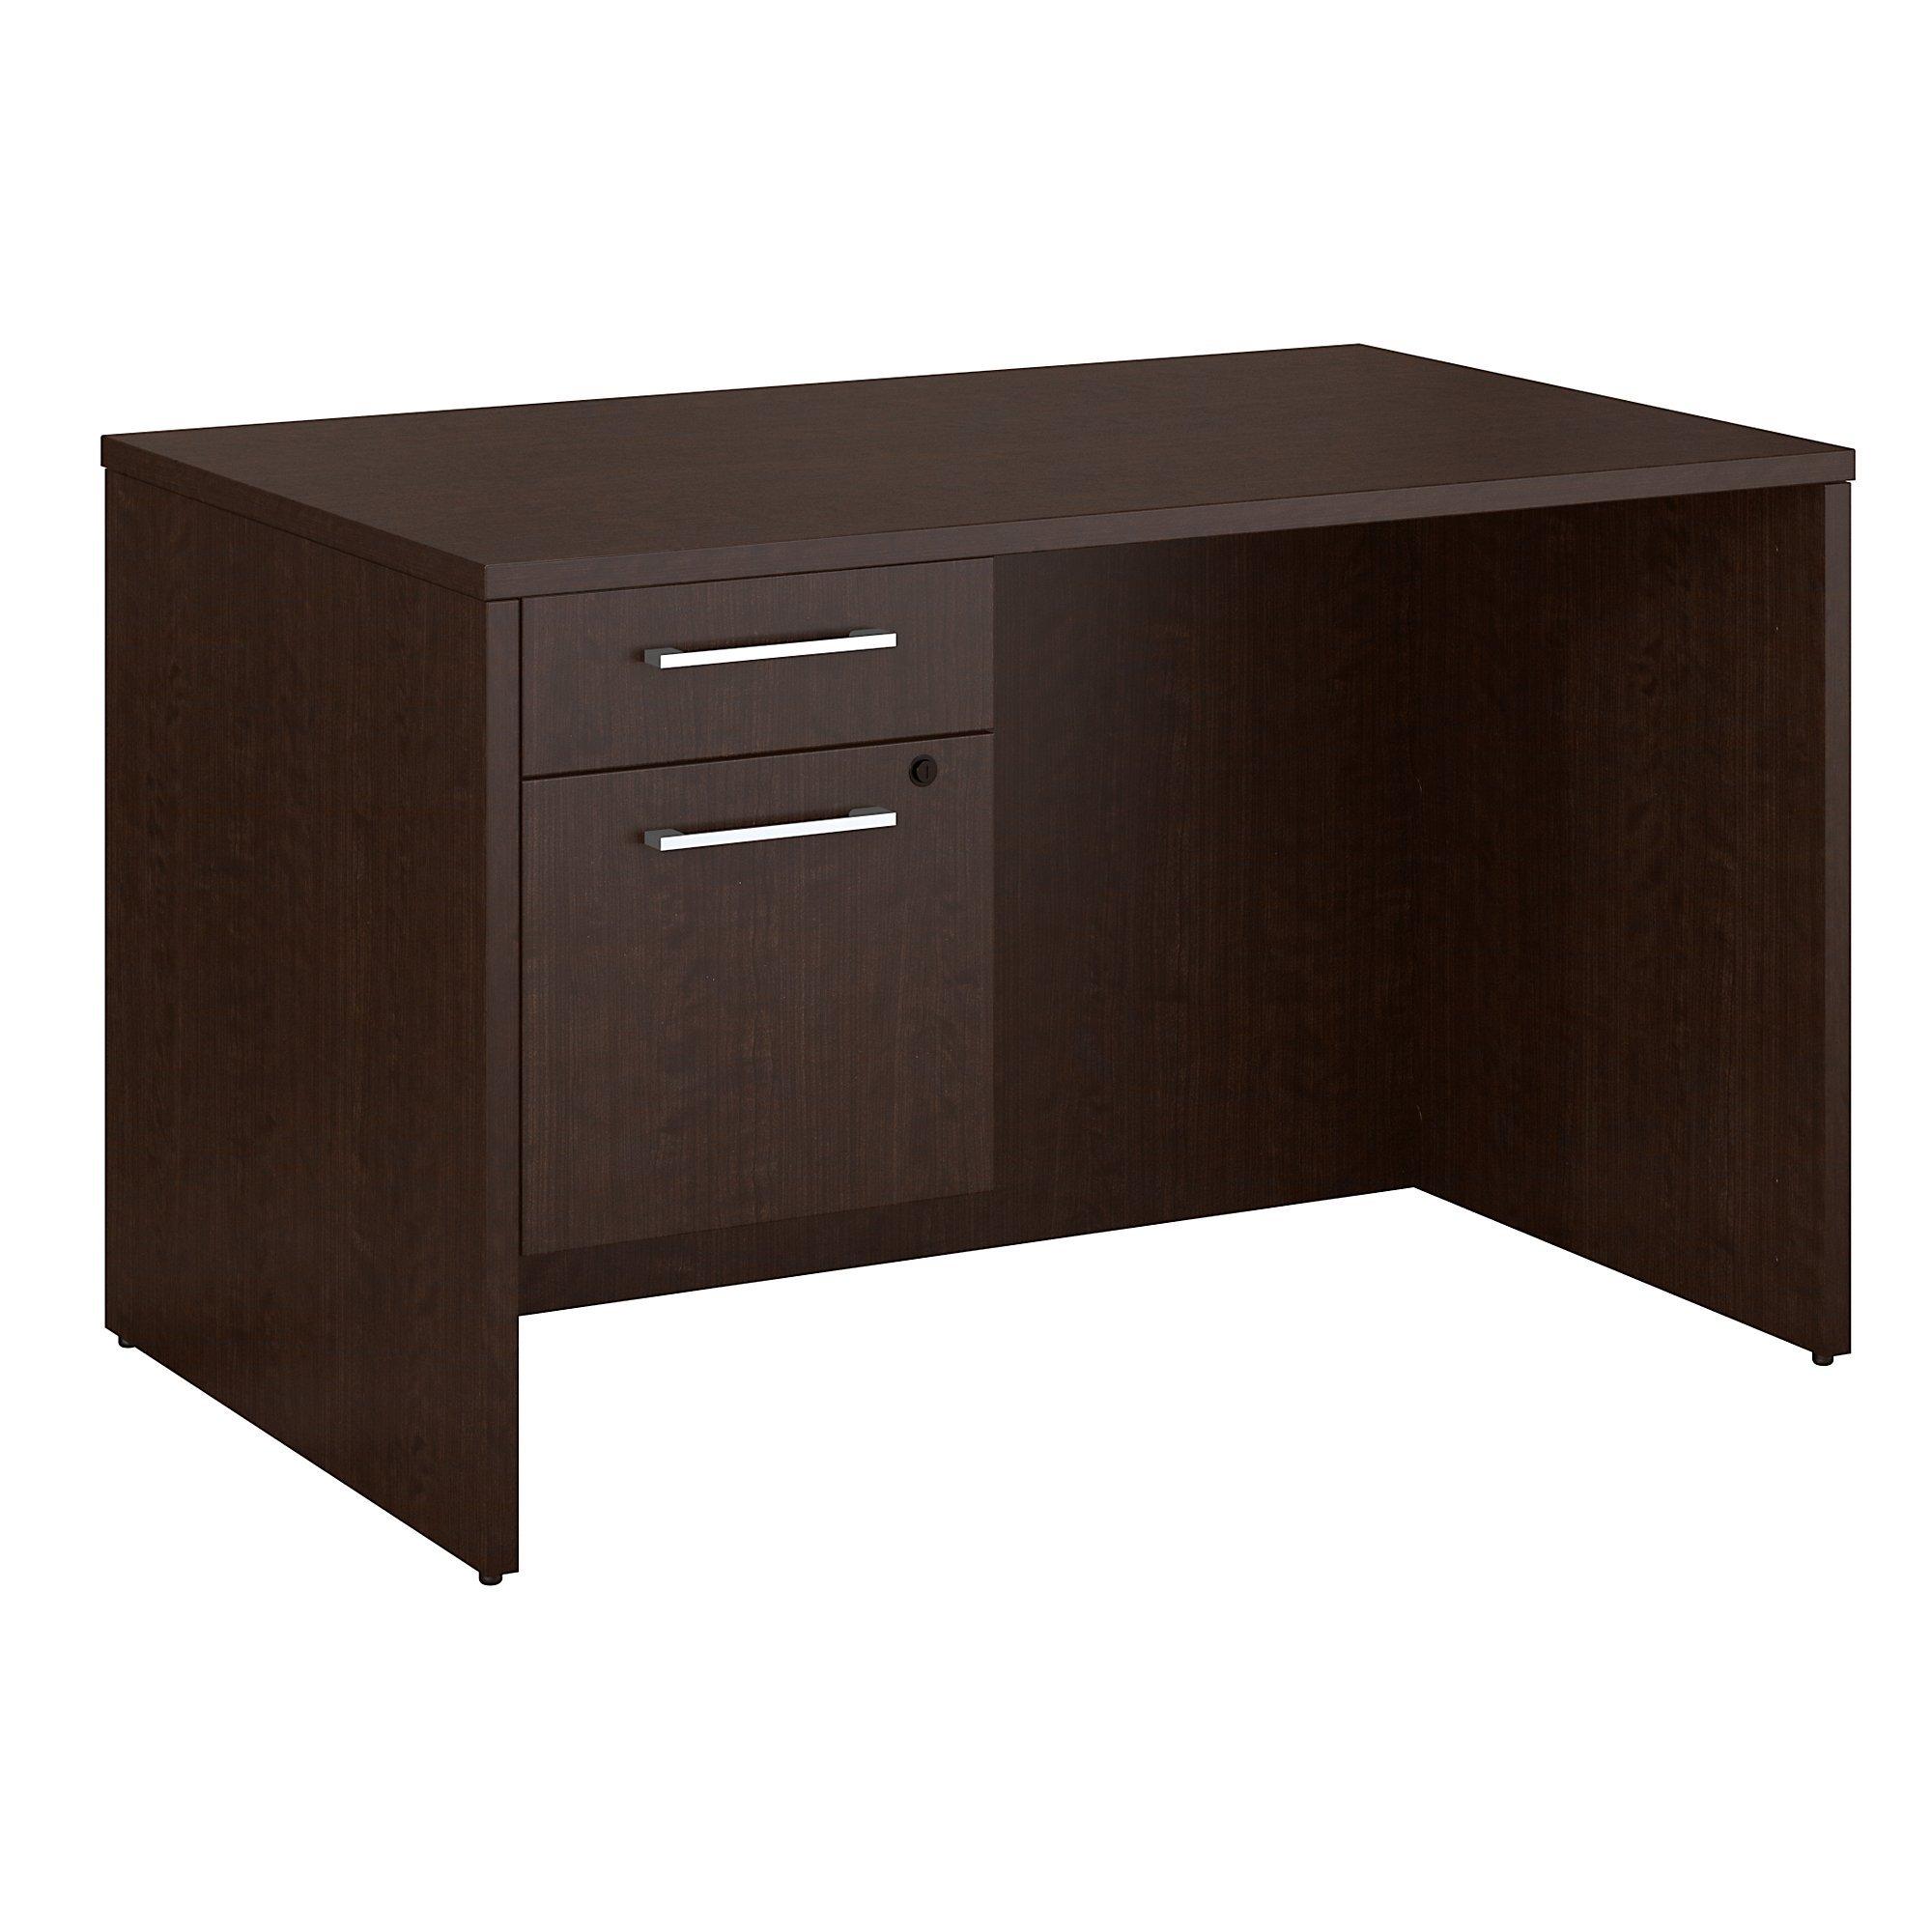 Bush Business Furniture Desk with Pedestal 300S092MR, Mocha Cherry